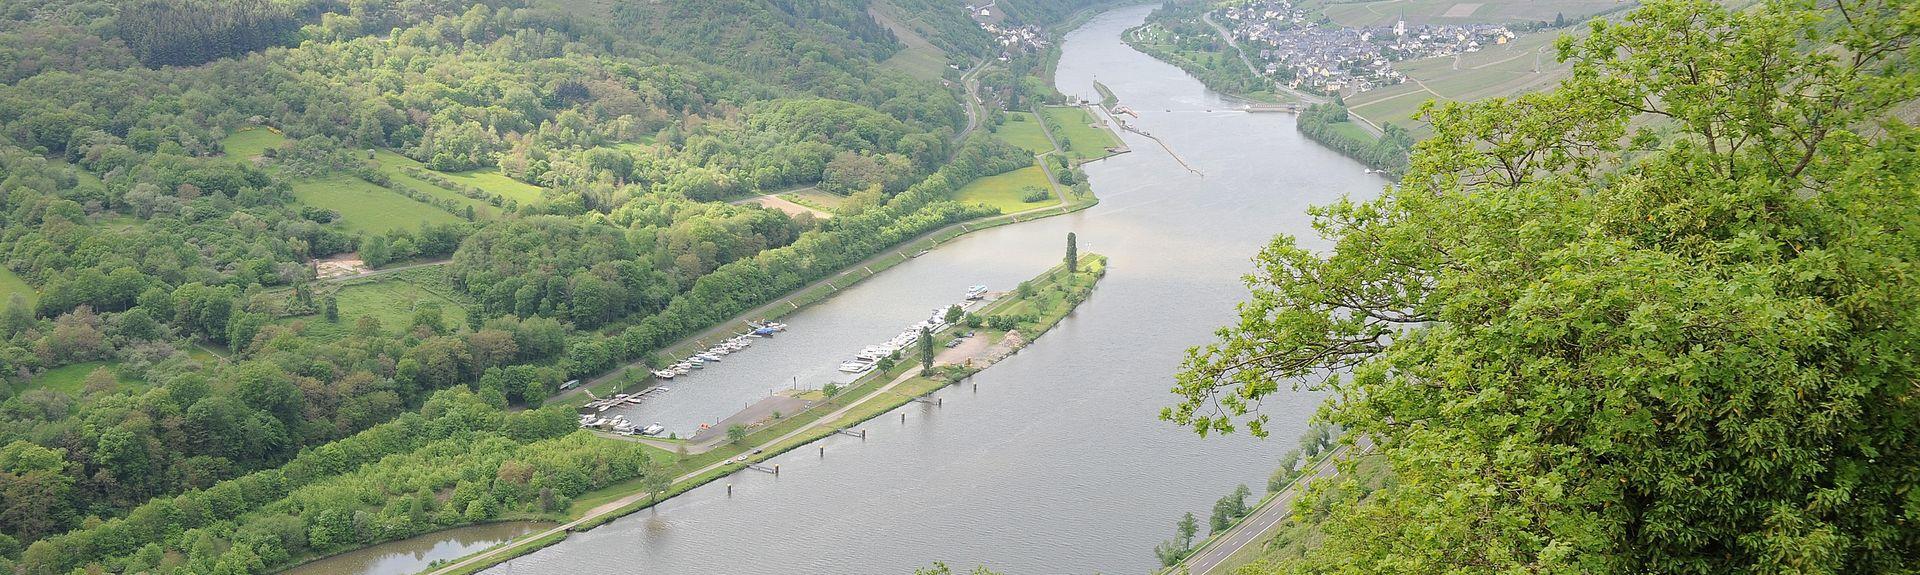 Brauneberg, Rijnland-Palts, Duitsland